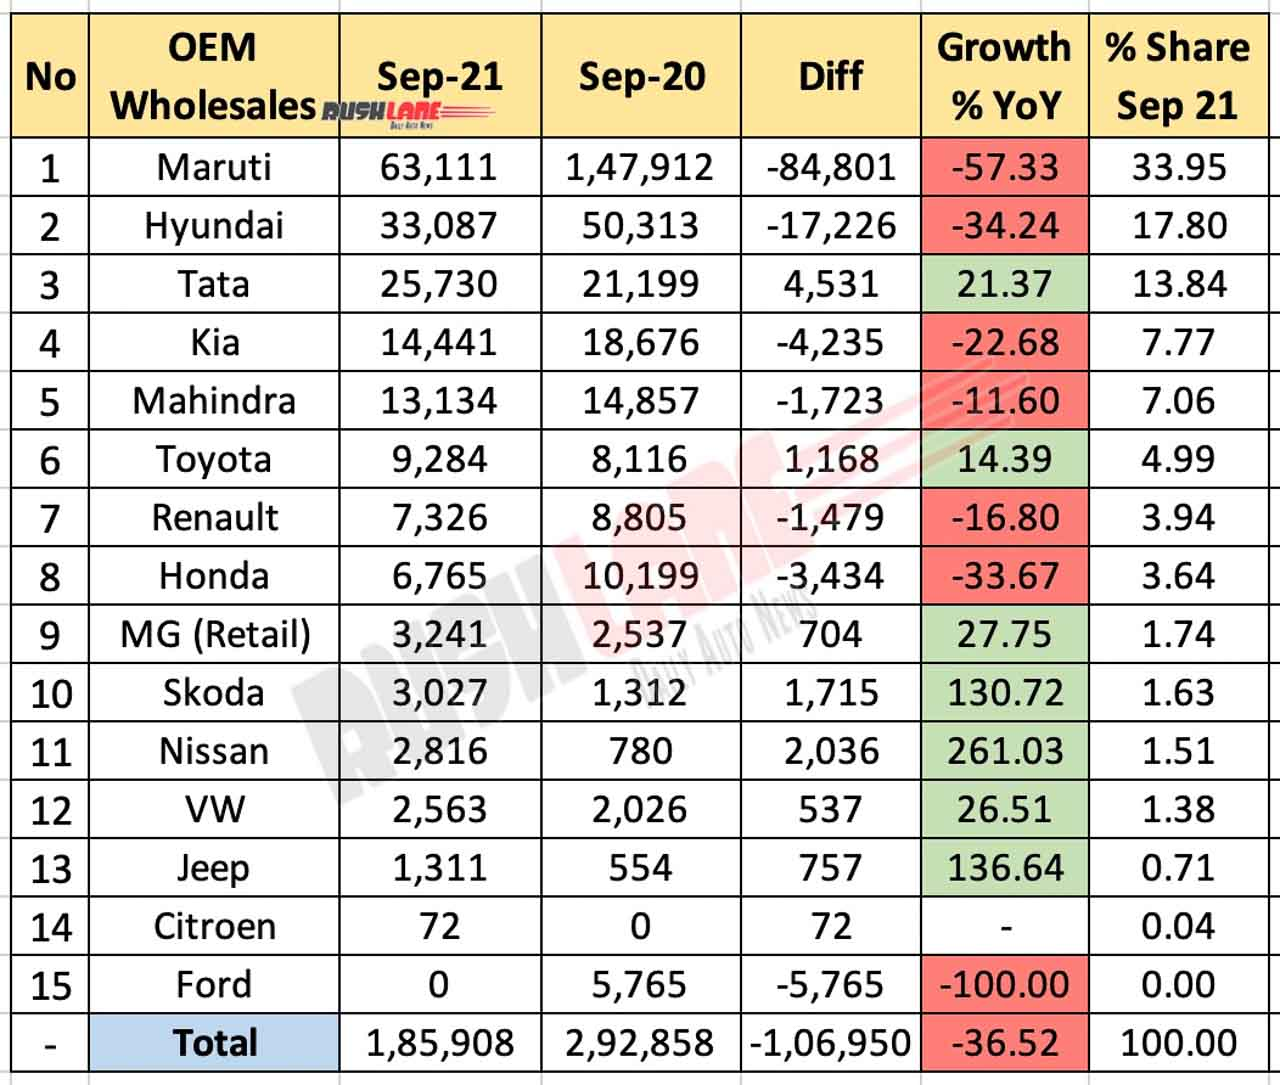 Car Sales September 2021 Vs September 2020 (YoY)